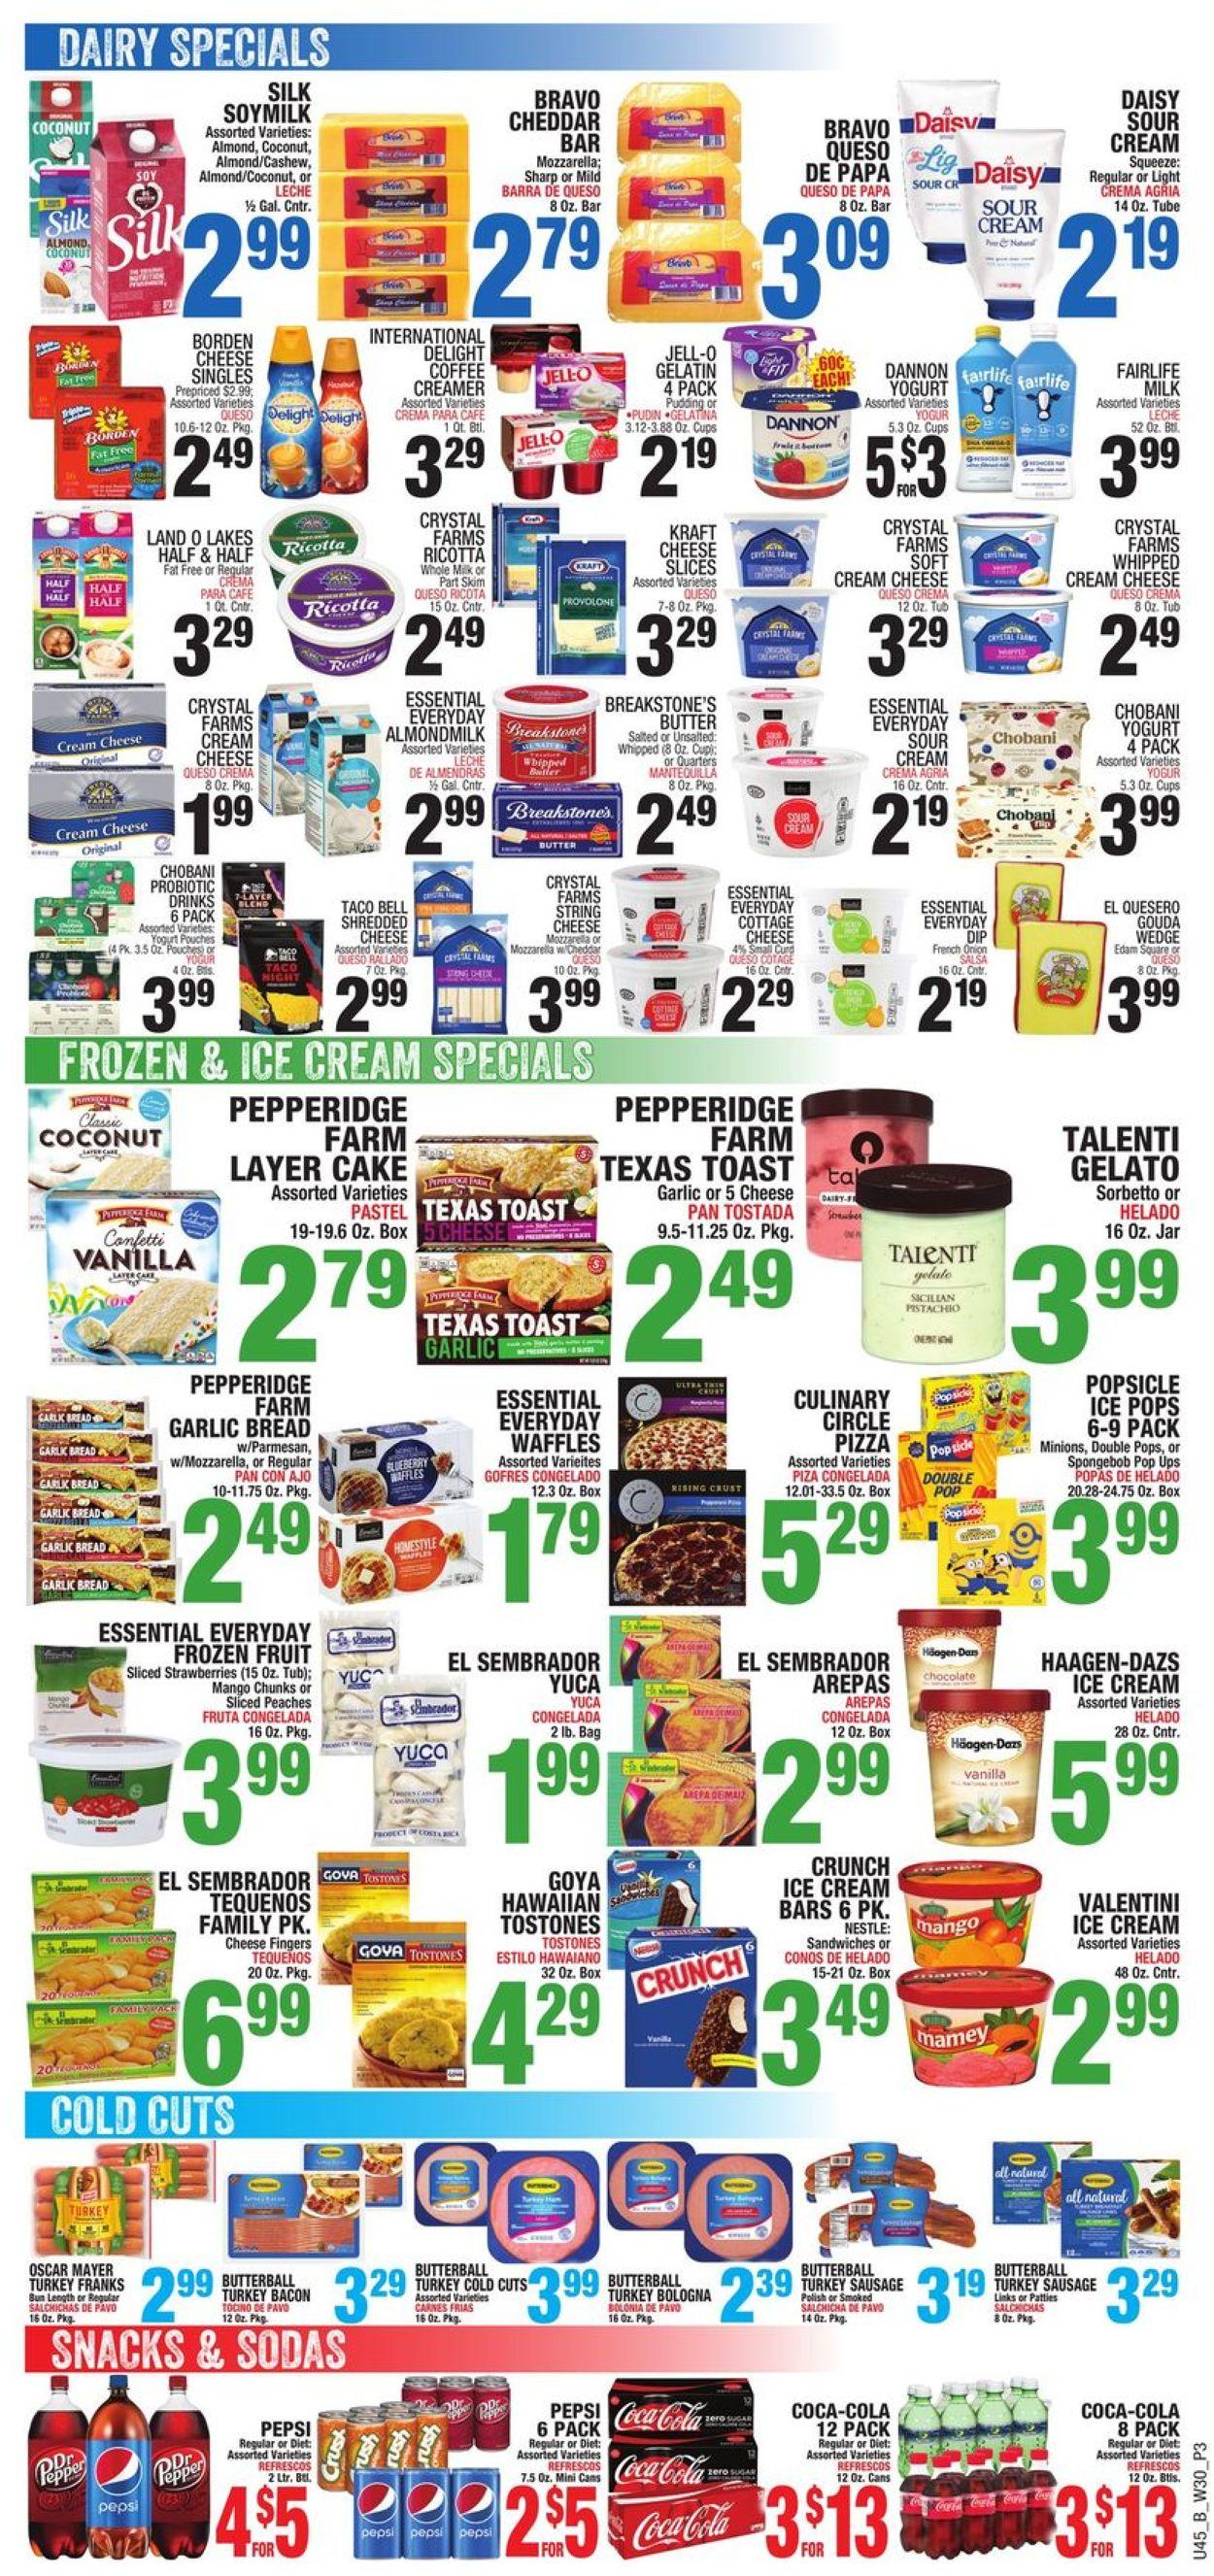 Bravo Supermarkets Weekly Ad Circular - valid 07/22-07/28/2021 (Page 3)